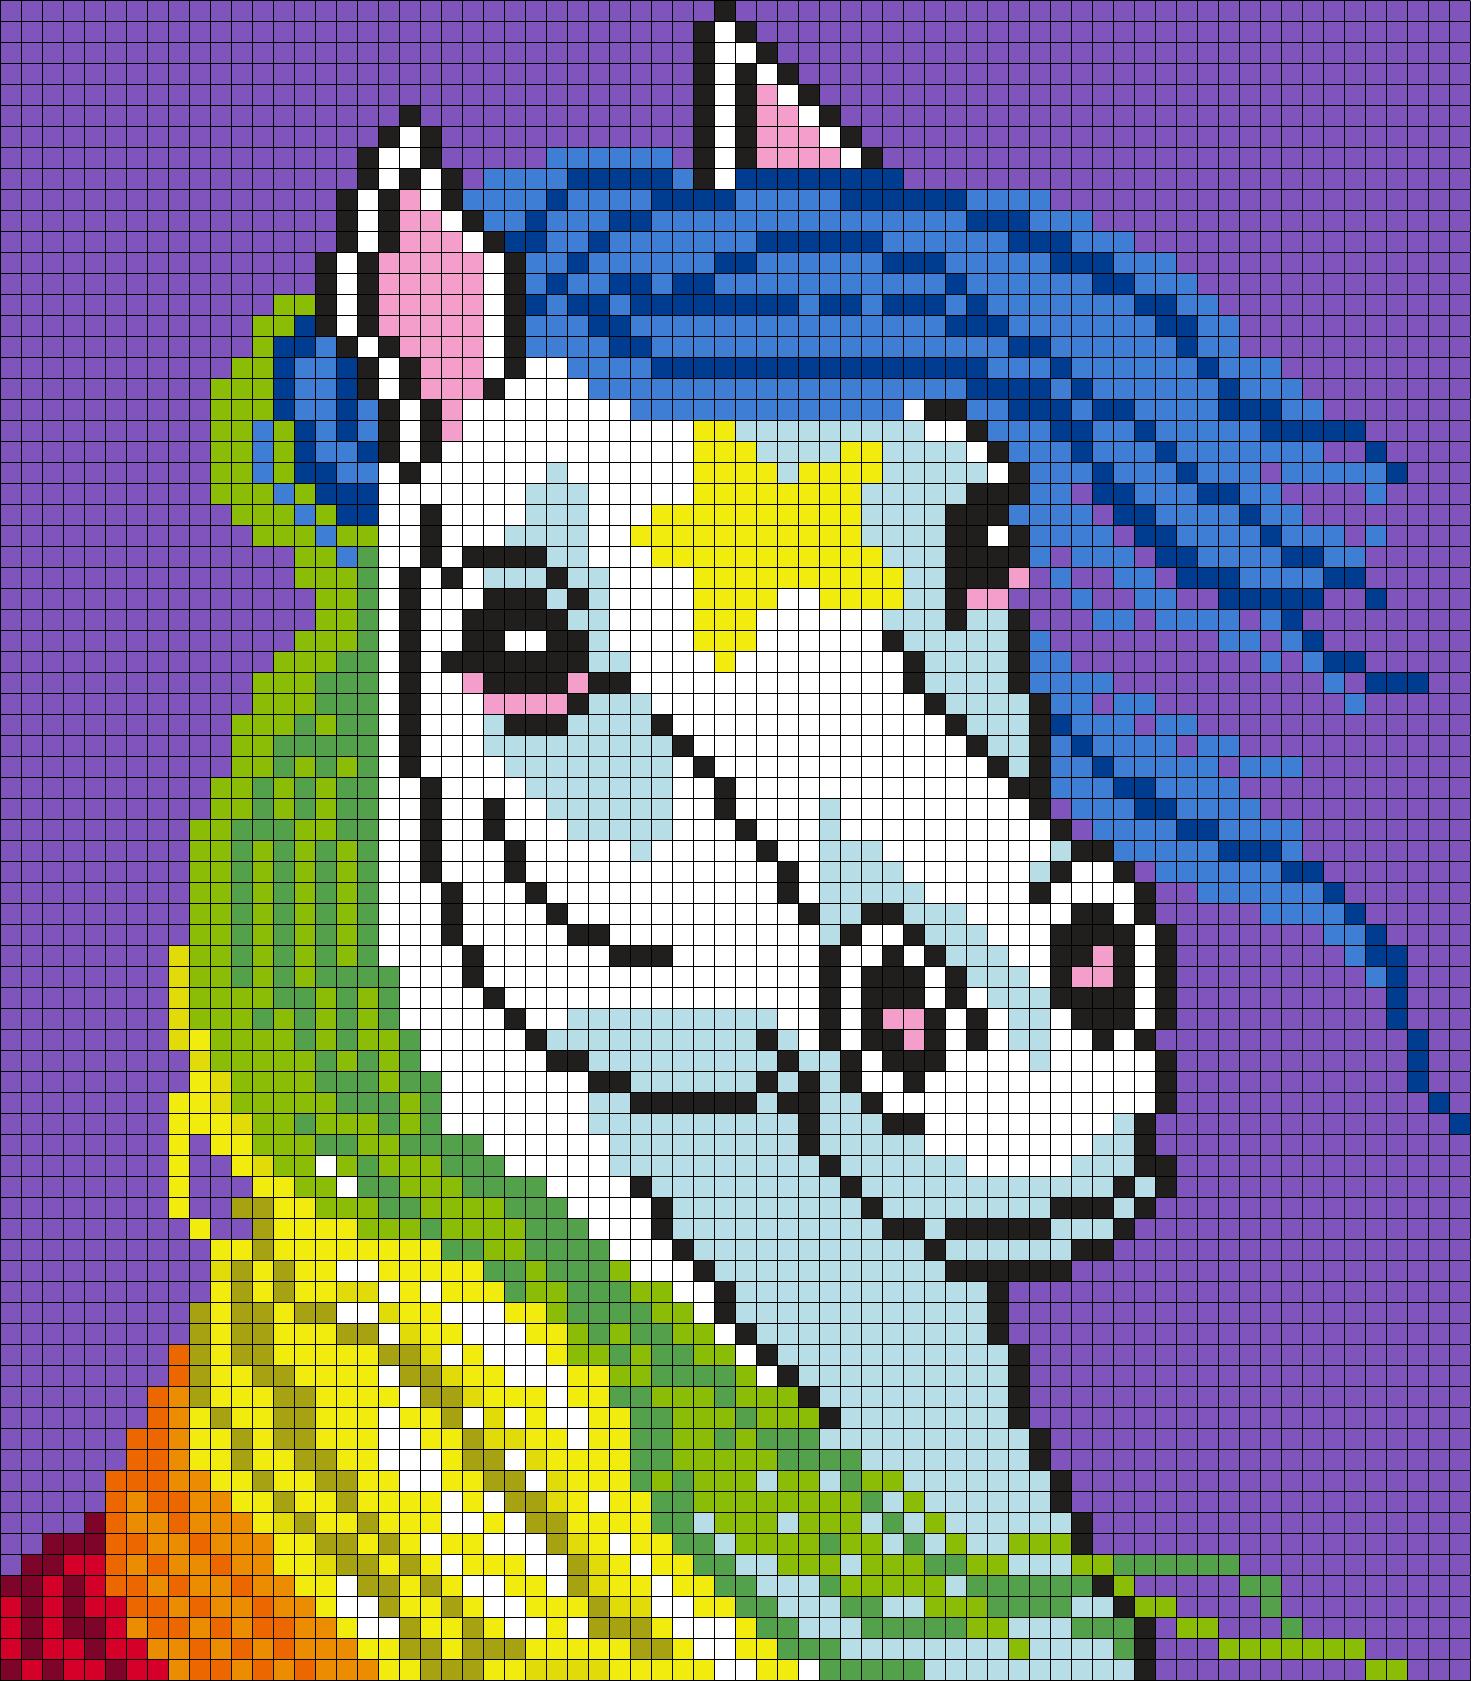 Starlite From Rainbow Brite (Square) Perler Bead Pattern / Bead Sprite